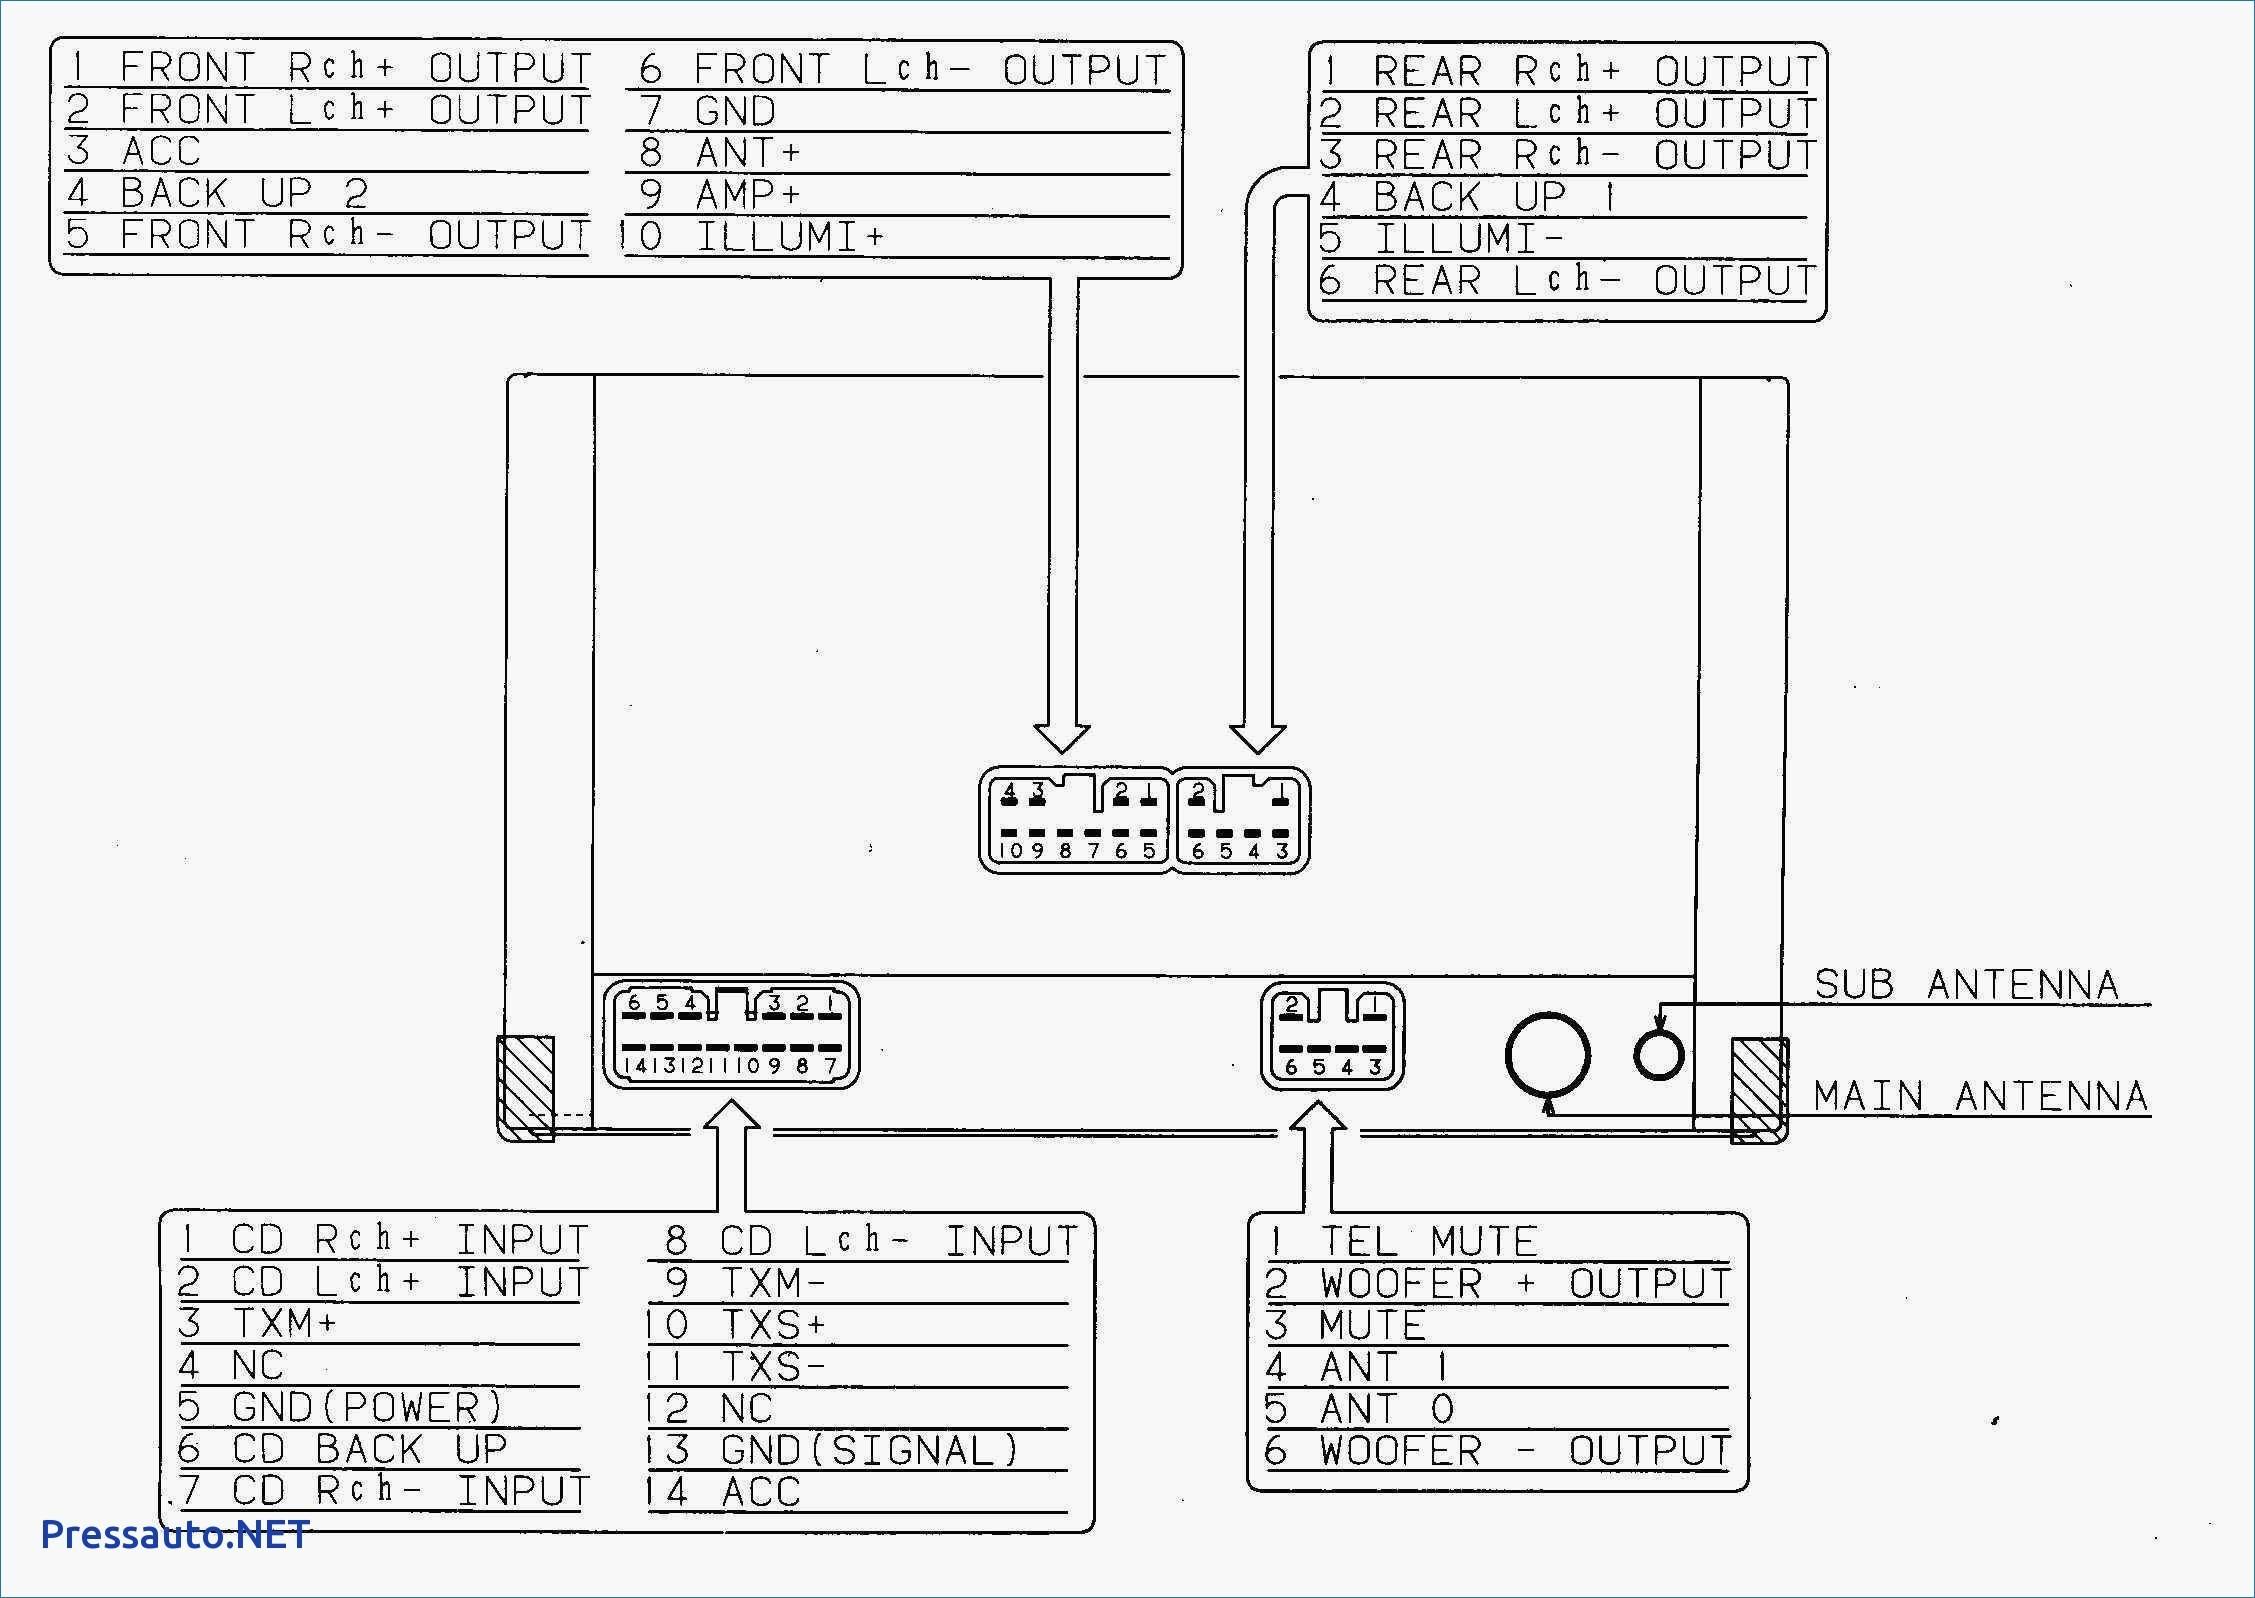 speaker wire diagram for car audio my wiring diagram rh detoxicrecenze com sony car radio wiring diagram kenwood car radio wire diagram